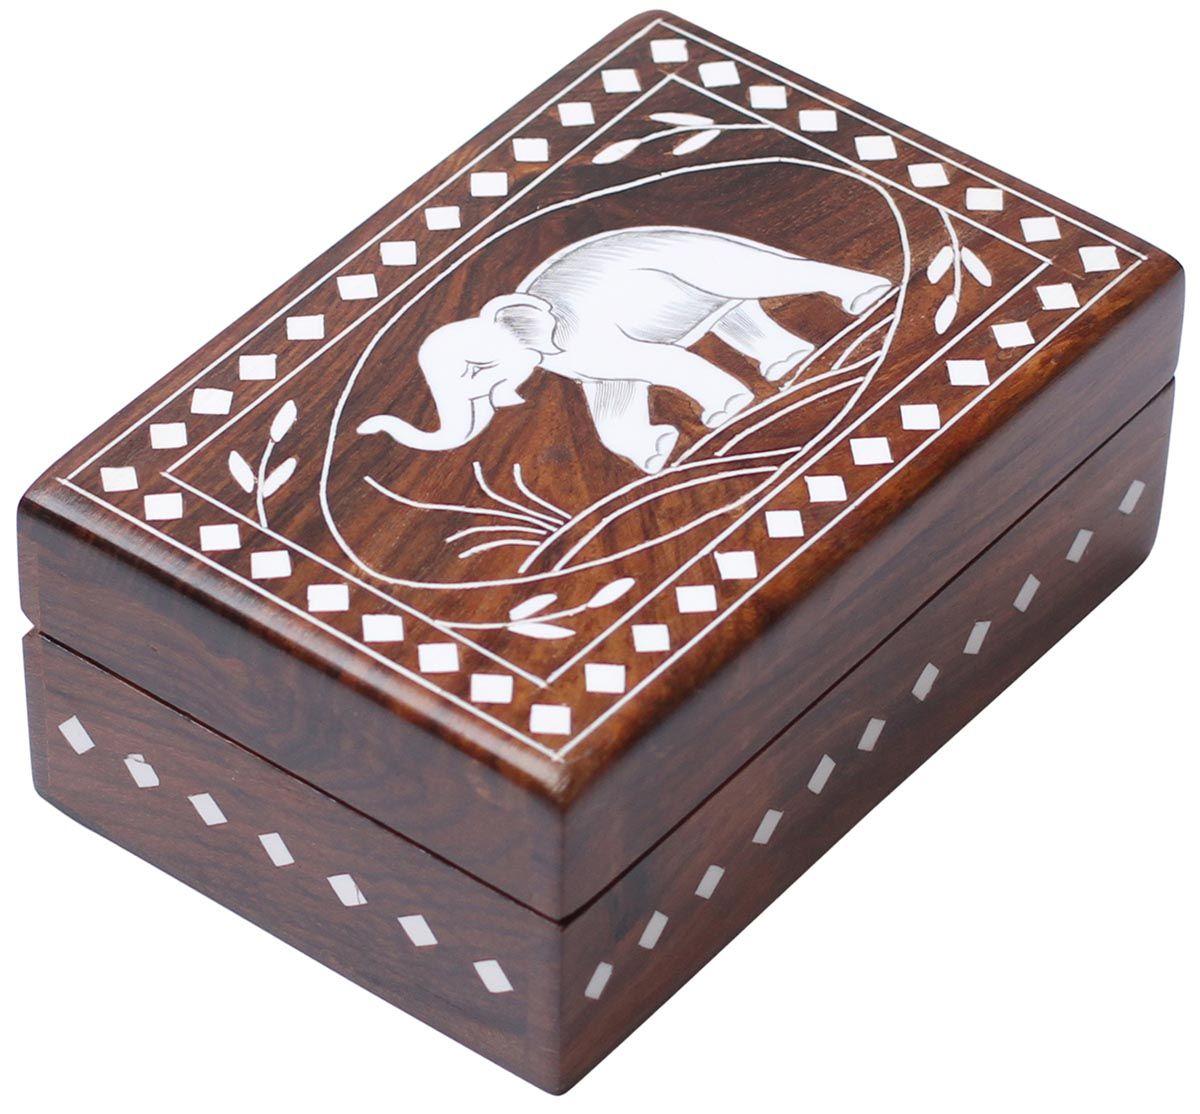 Handmade Wood Jewelry Box With Lid On Hinges Keepsake Rectangular Box